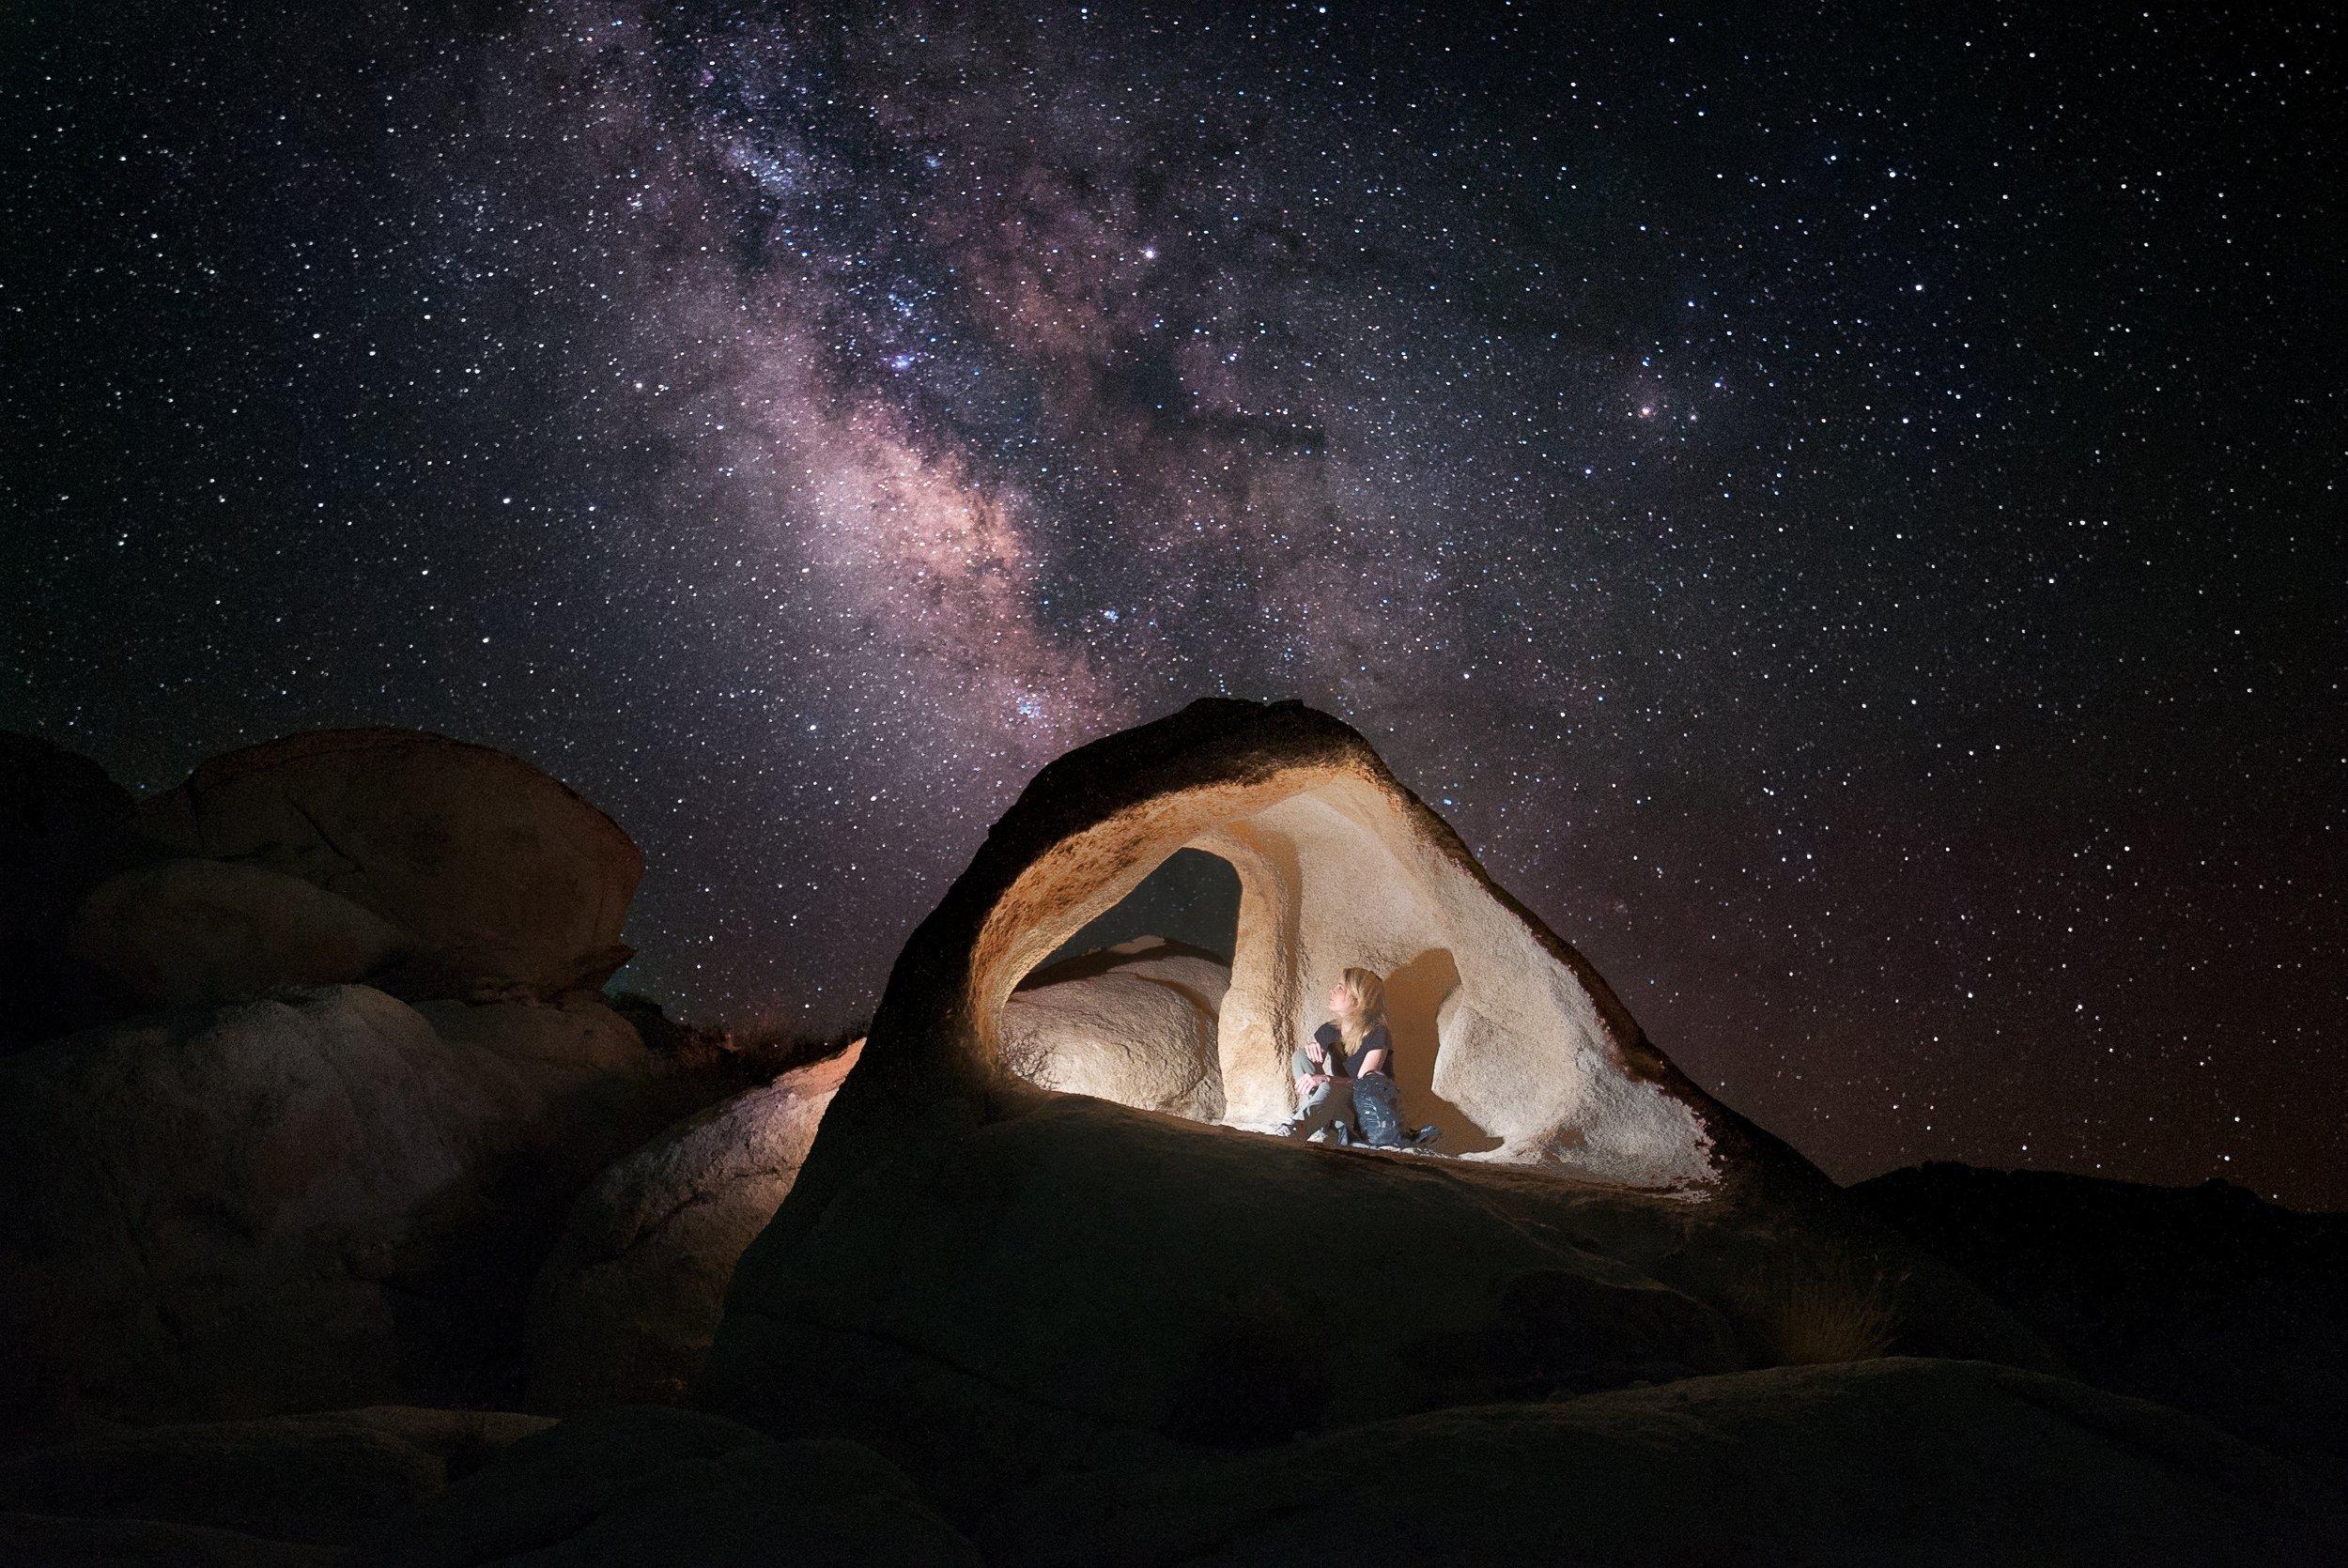 Sean Parker. Joshua Tree National Park, United States.